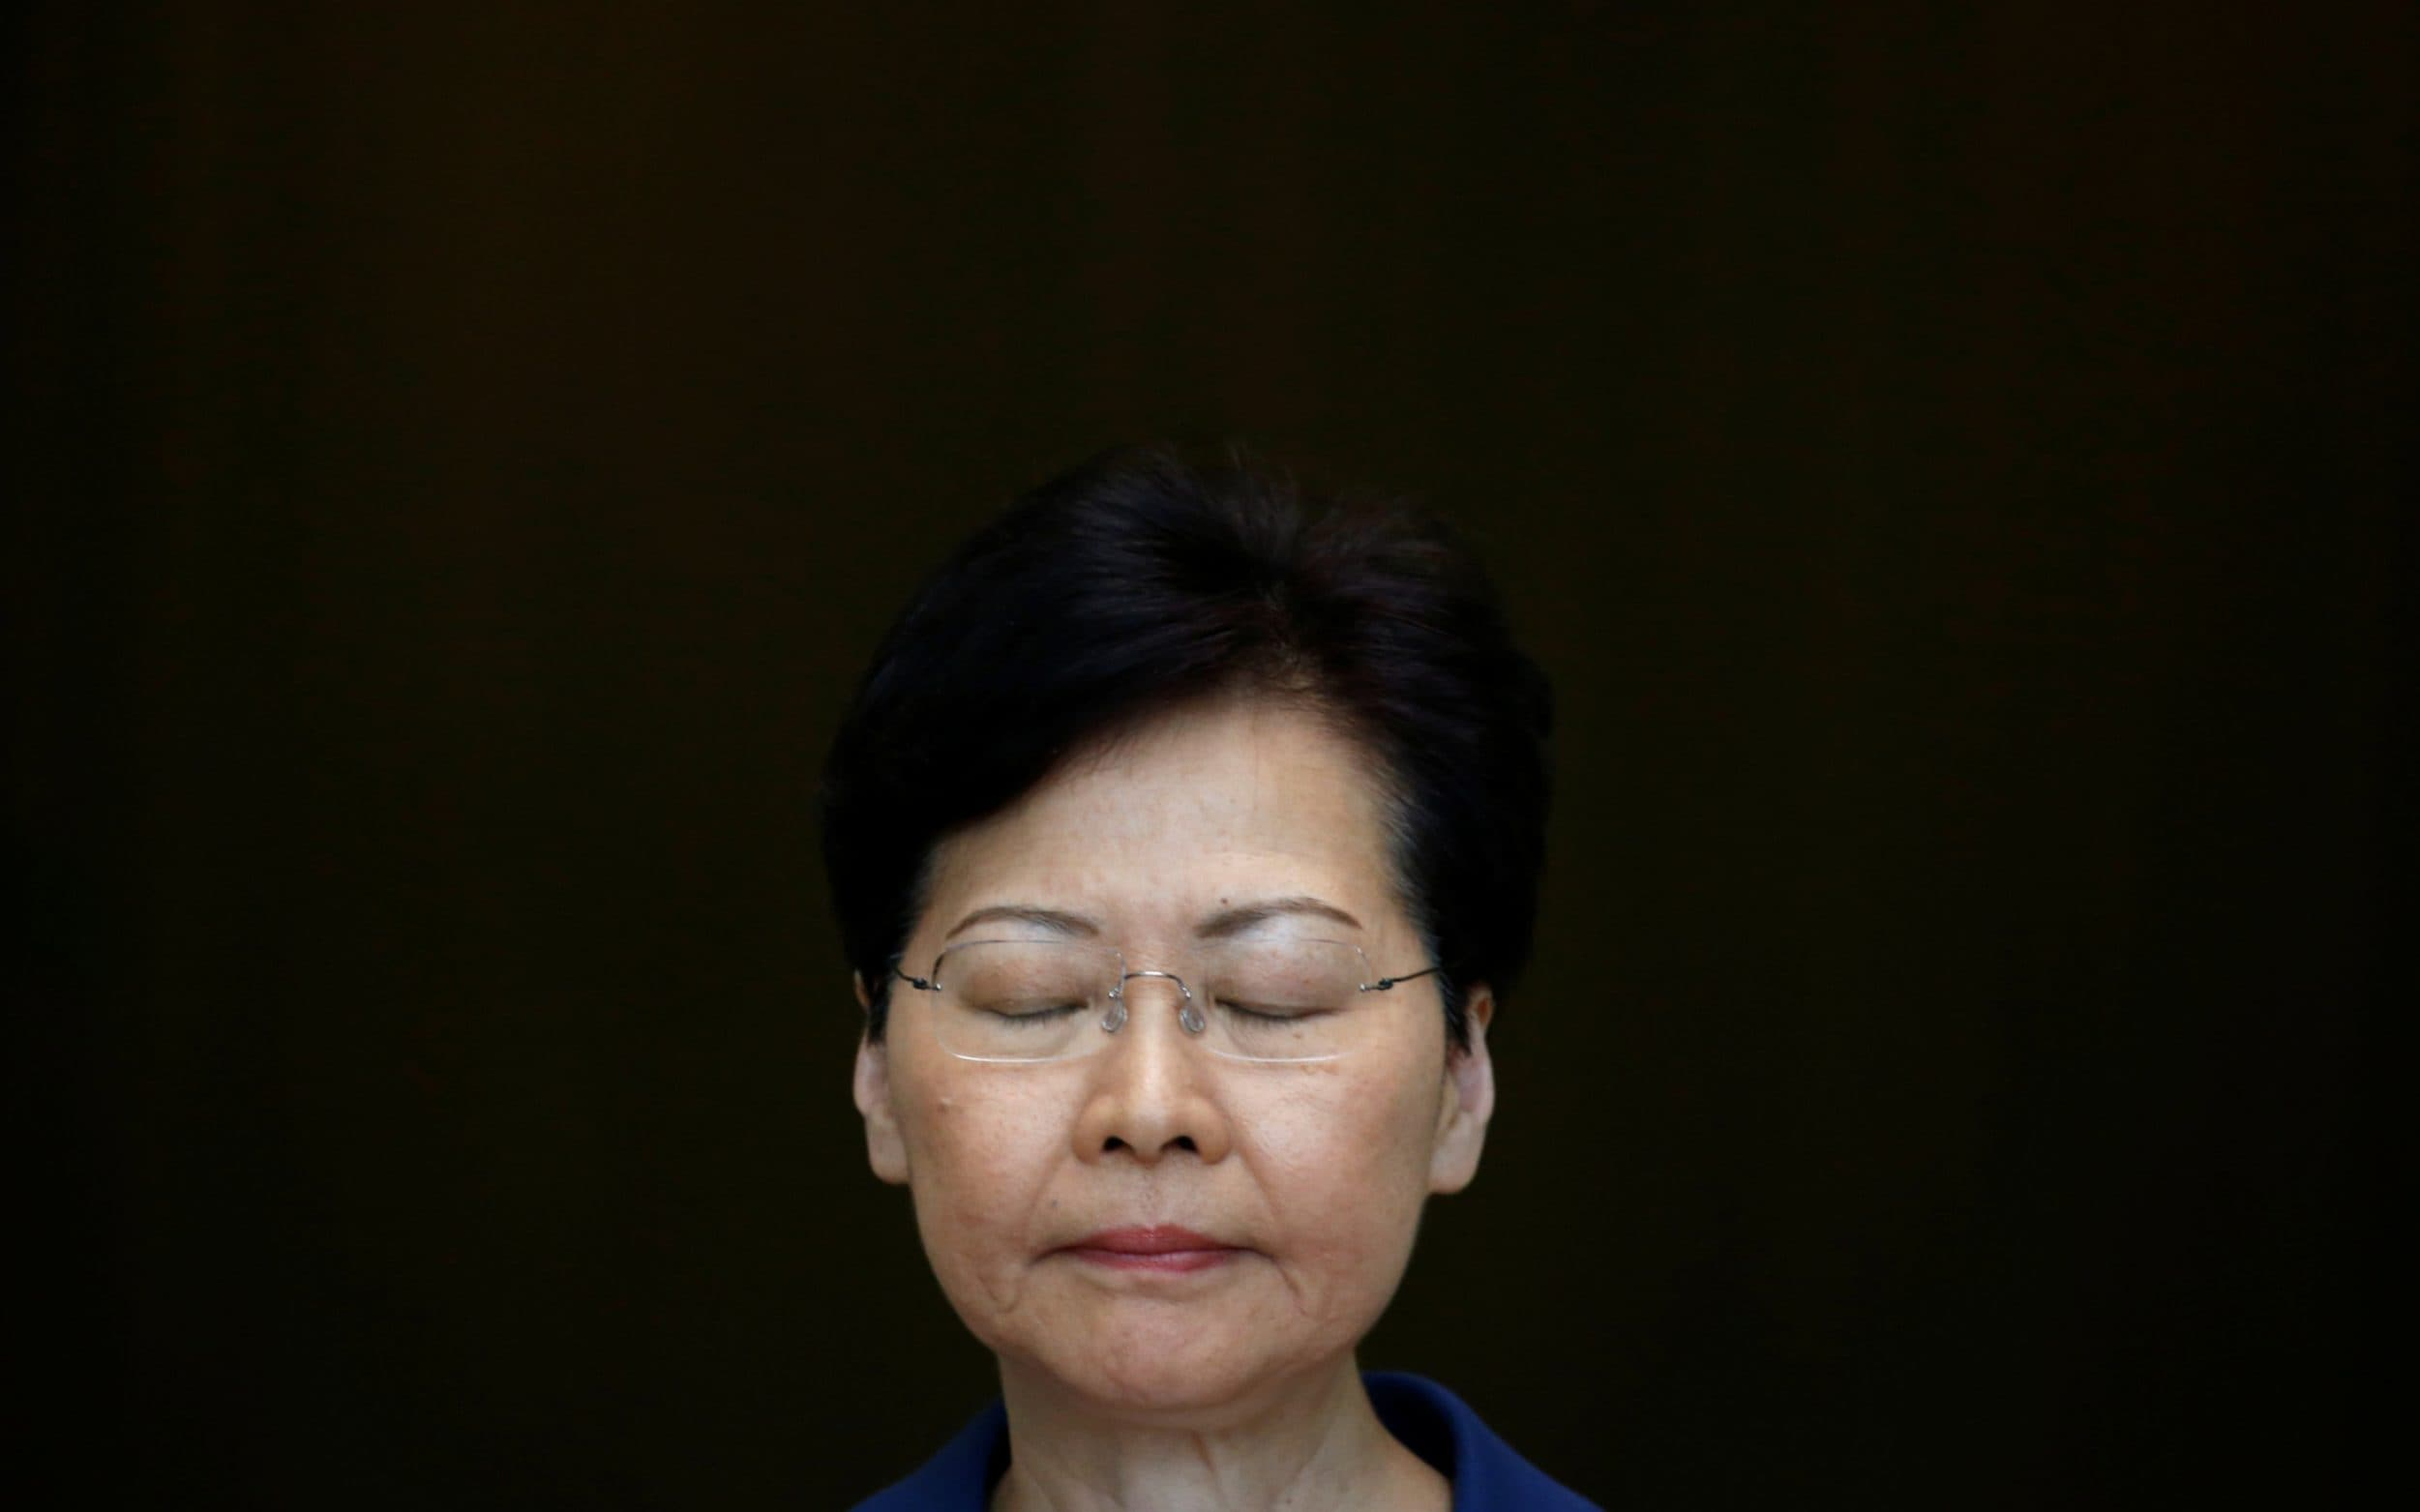 Hong Kong airport cancels flights as Carrie Lam warns of path of no return